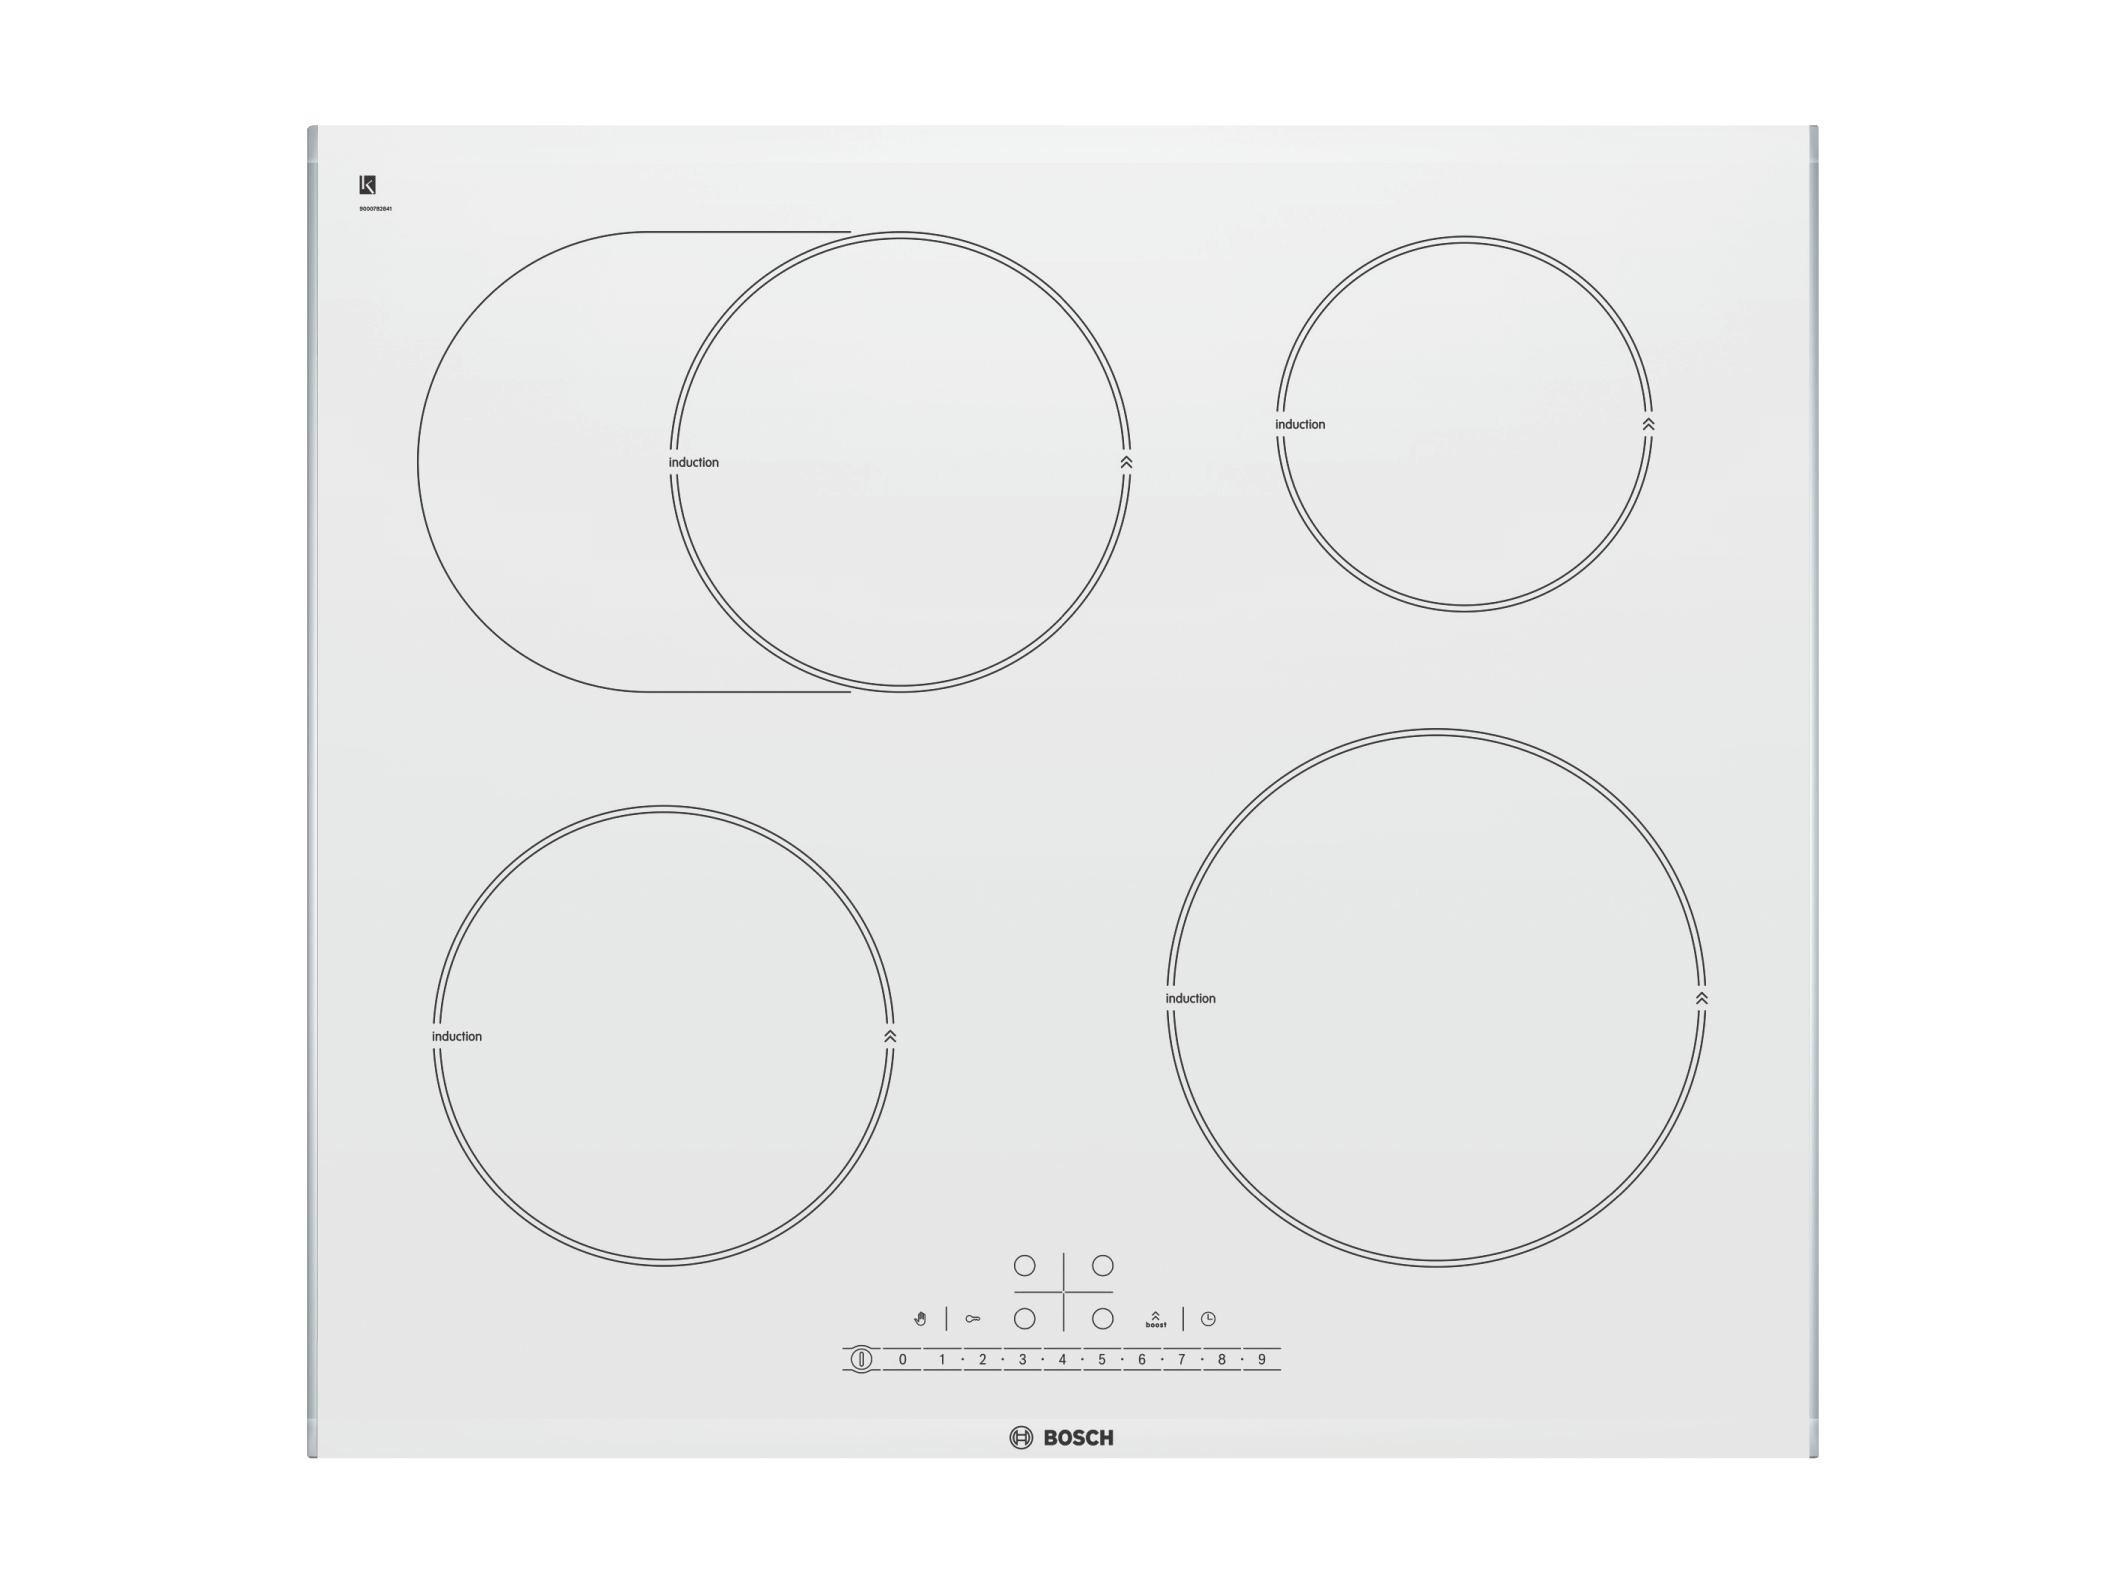 Induktionskochfeld Bosch Pib672f17e, 4 Kochzonen - KONVENTIONELL, Glas/Metall (60,6/5,1/52,7cm) - BOSCH